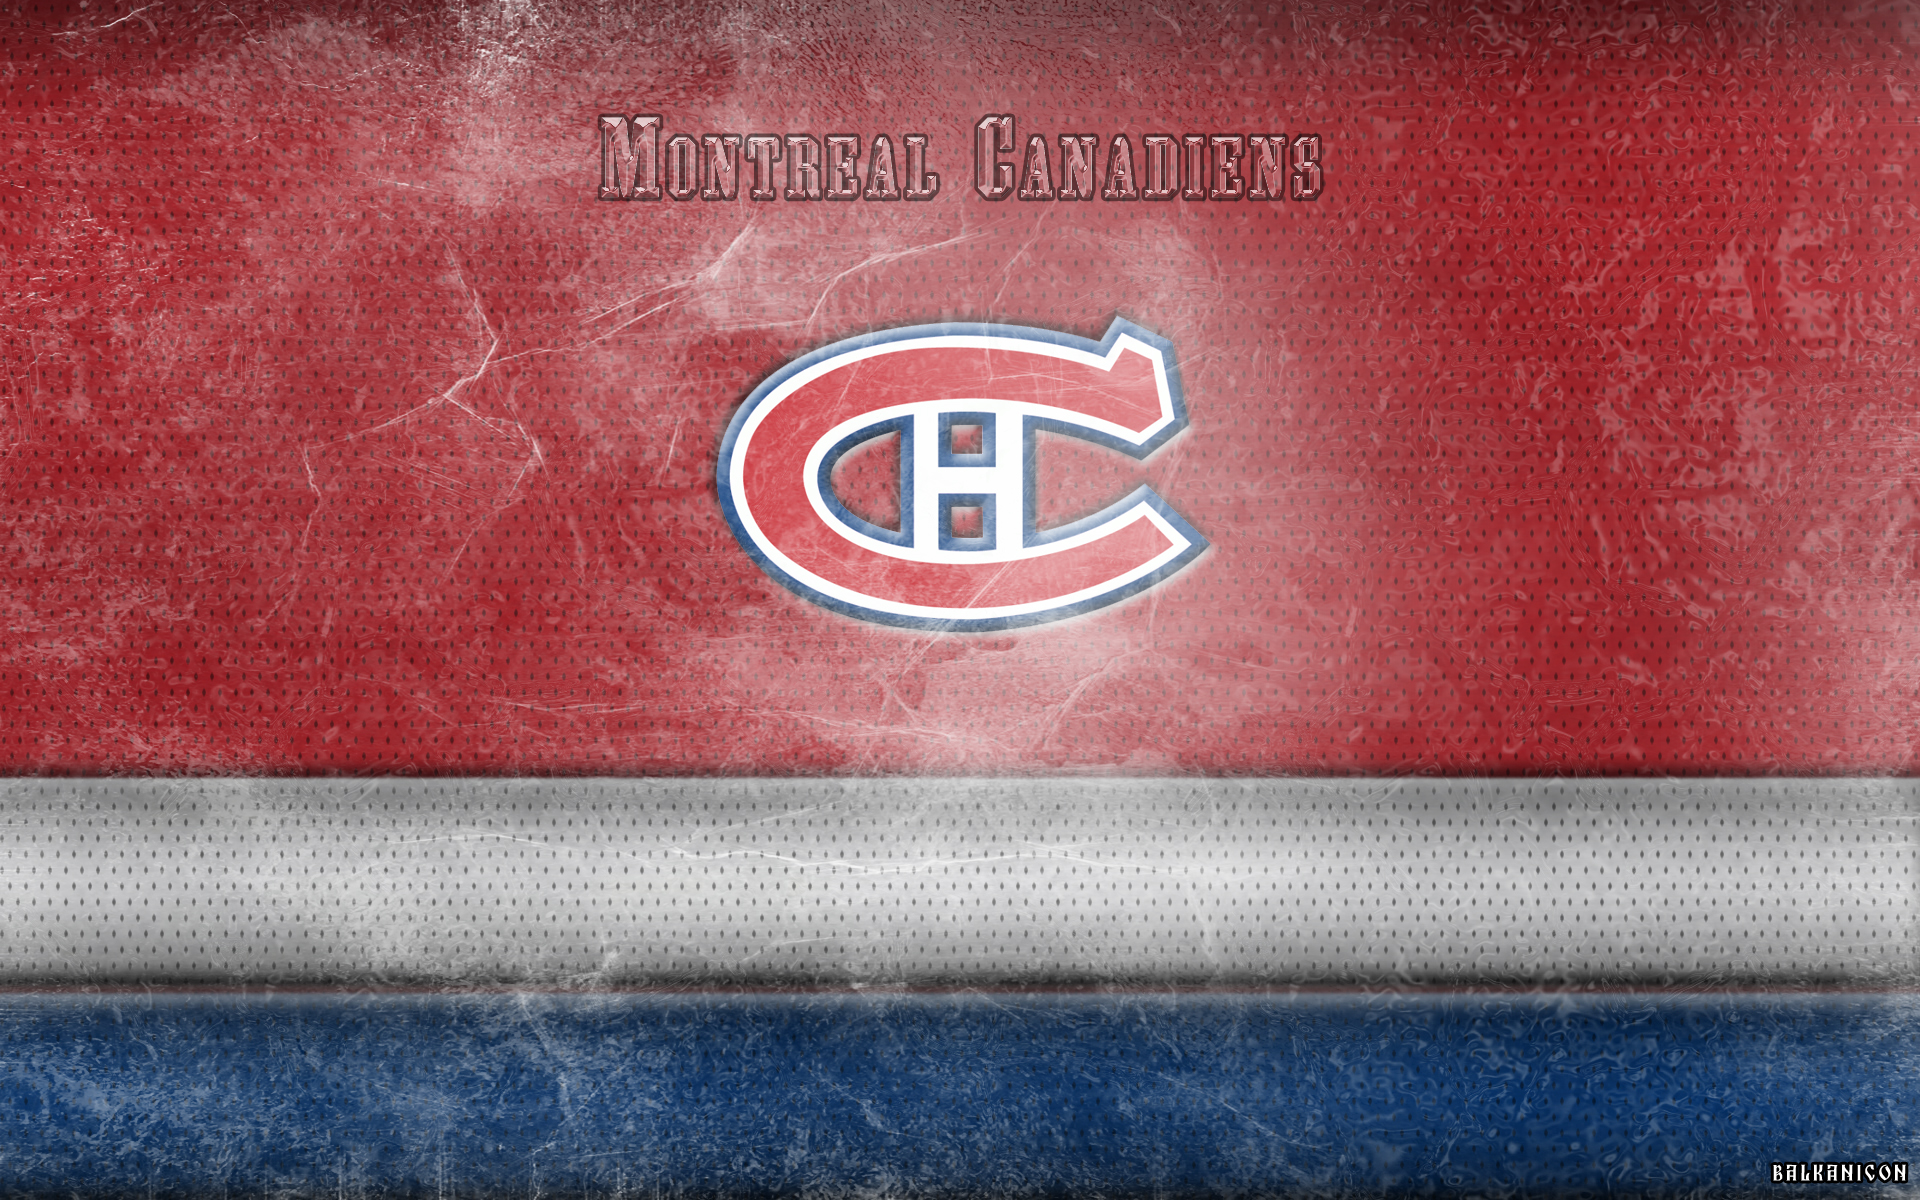 Montreal Canadiens Wallpaper Montreal canadiens wallpaper 1920x1200